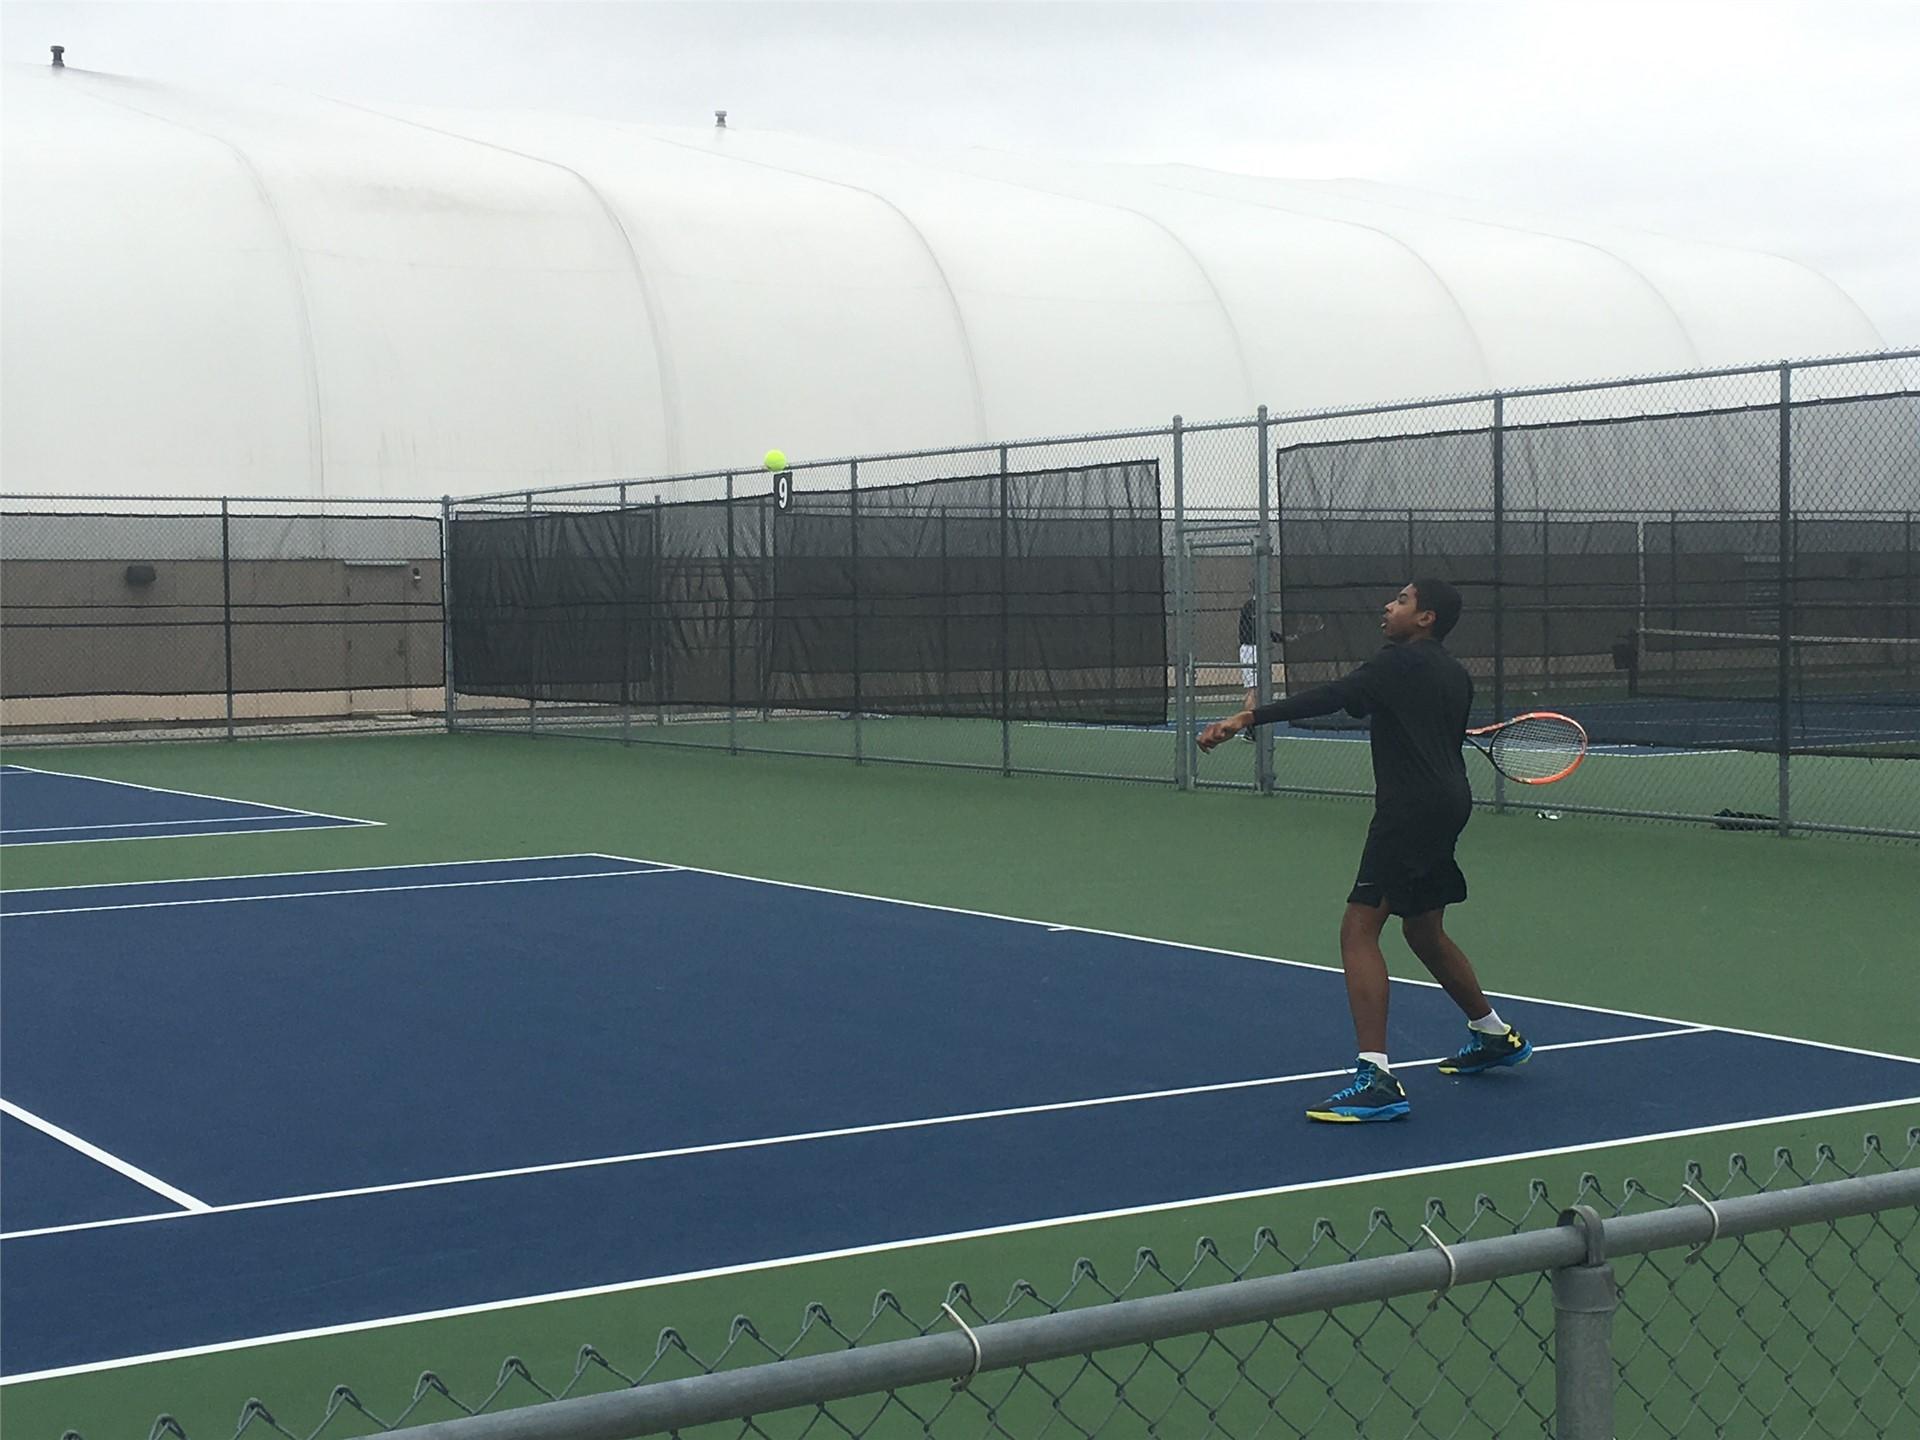 Tennis Player hitting